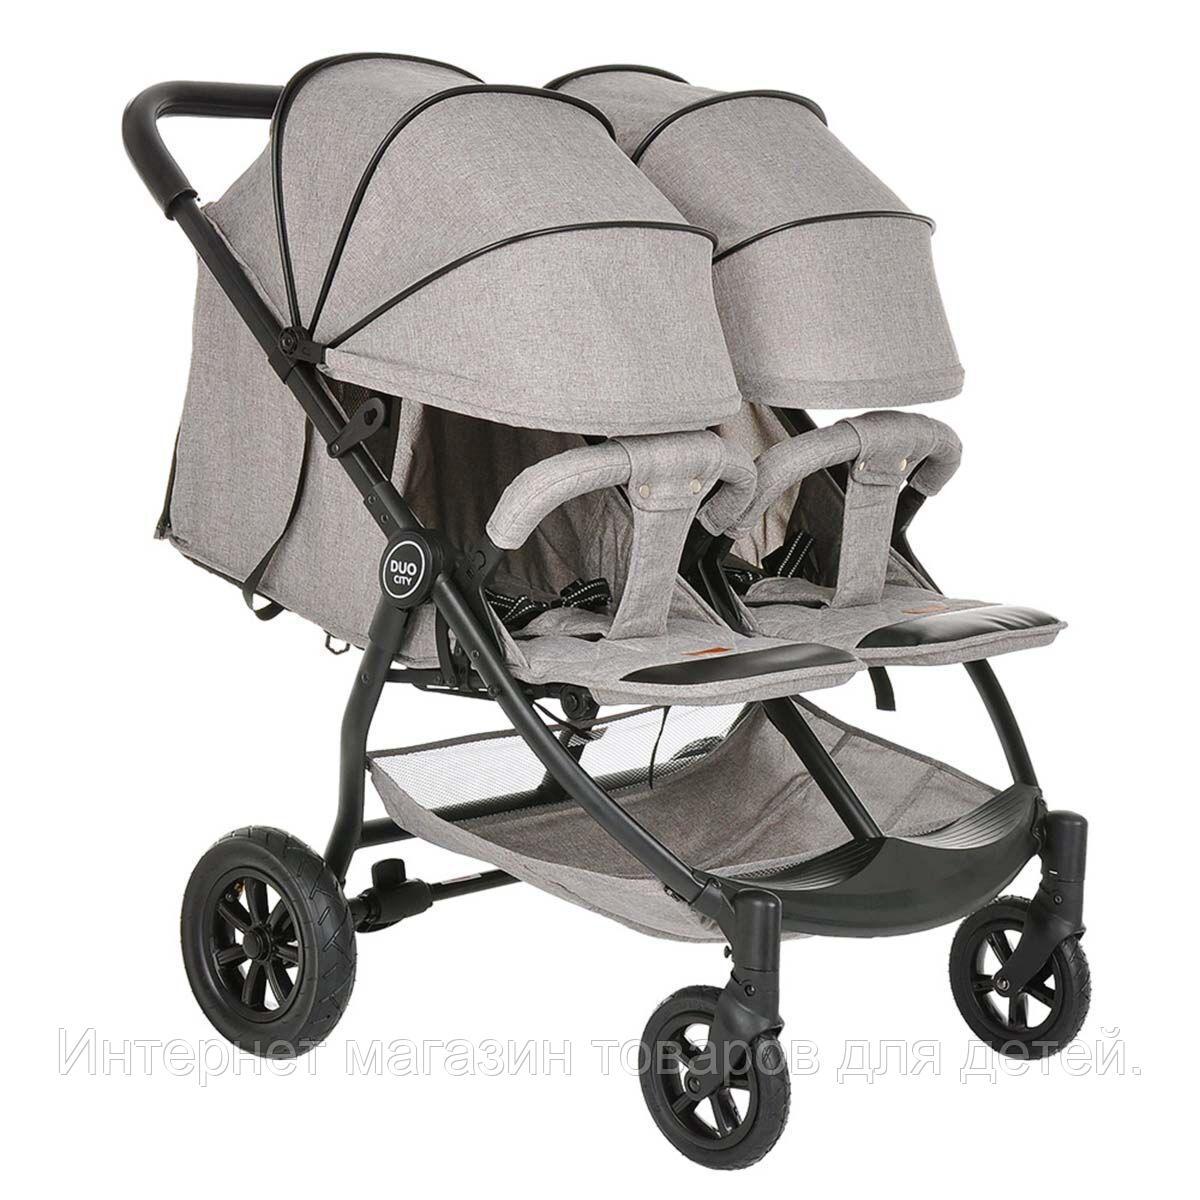 PITUSO Коляска детская DUOCITY для двойни (прогулочная), Beige/Бежевый/чехол на ножки/AIR